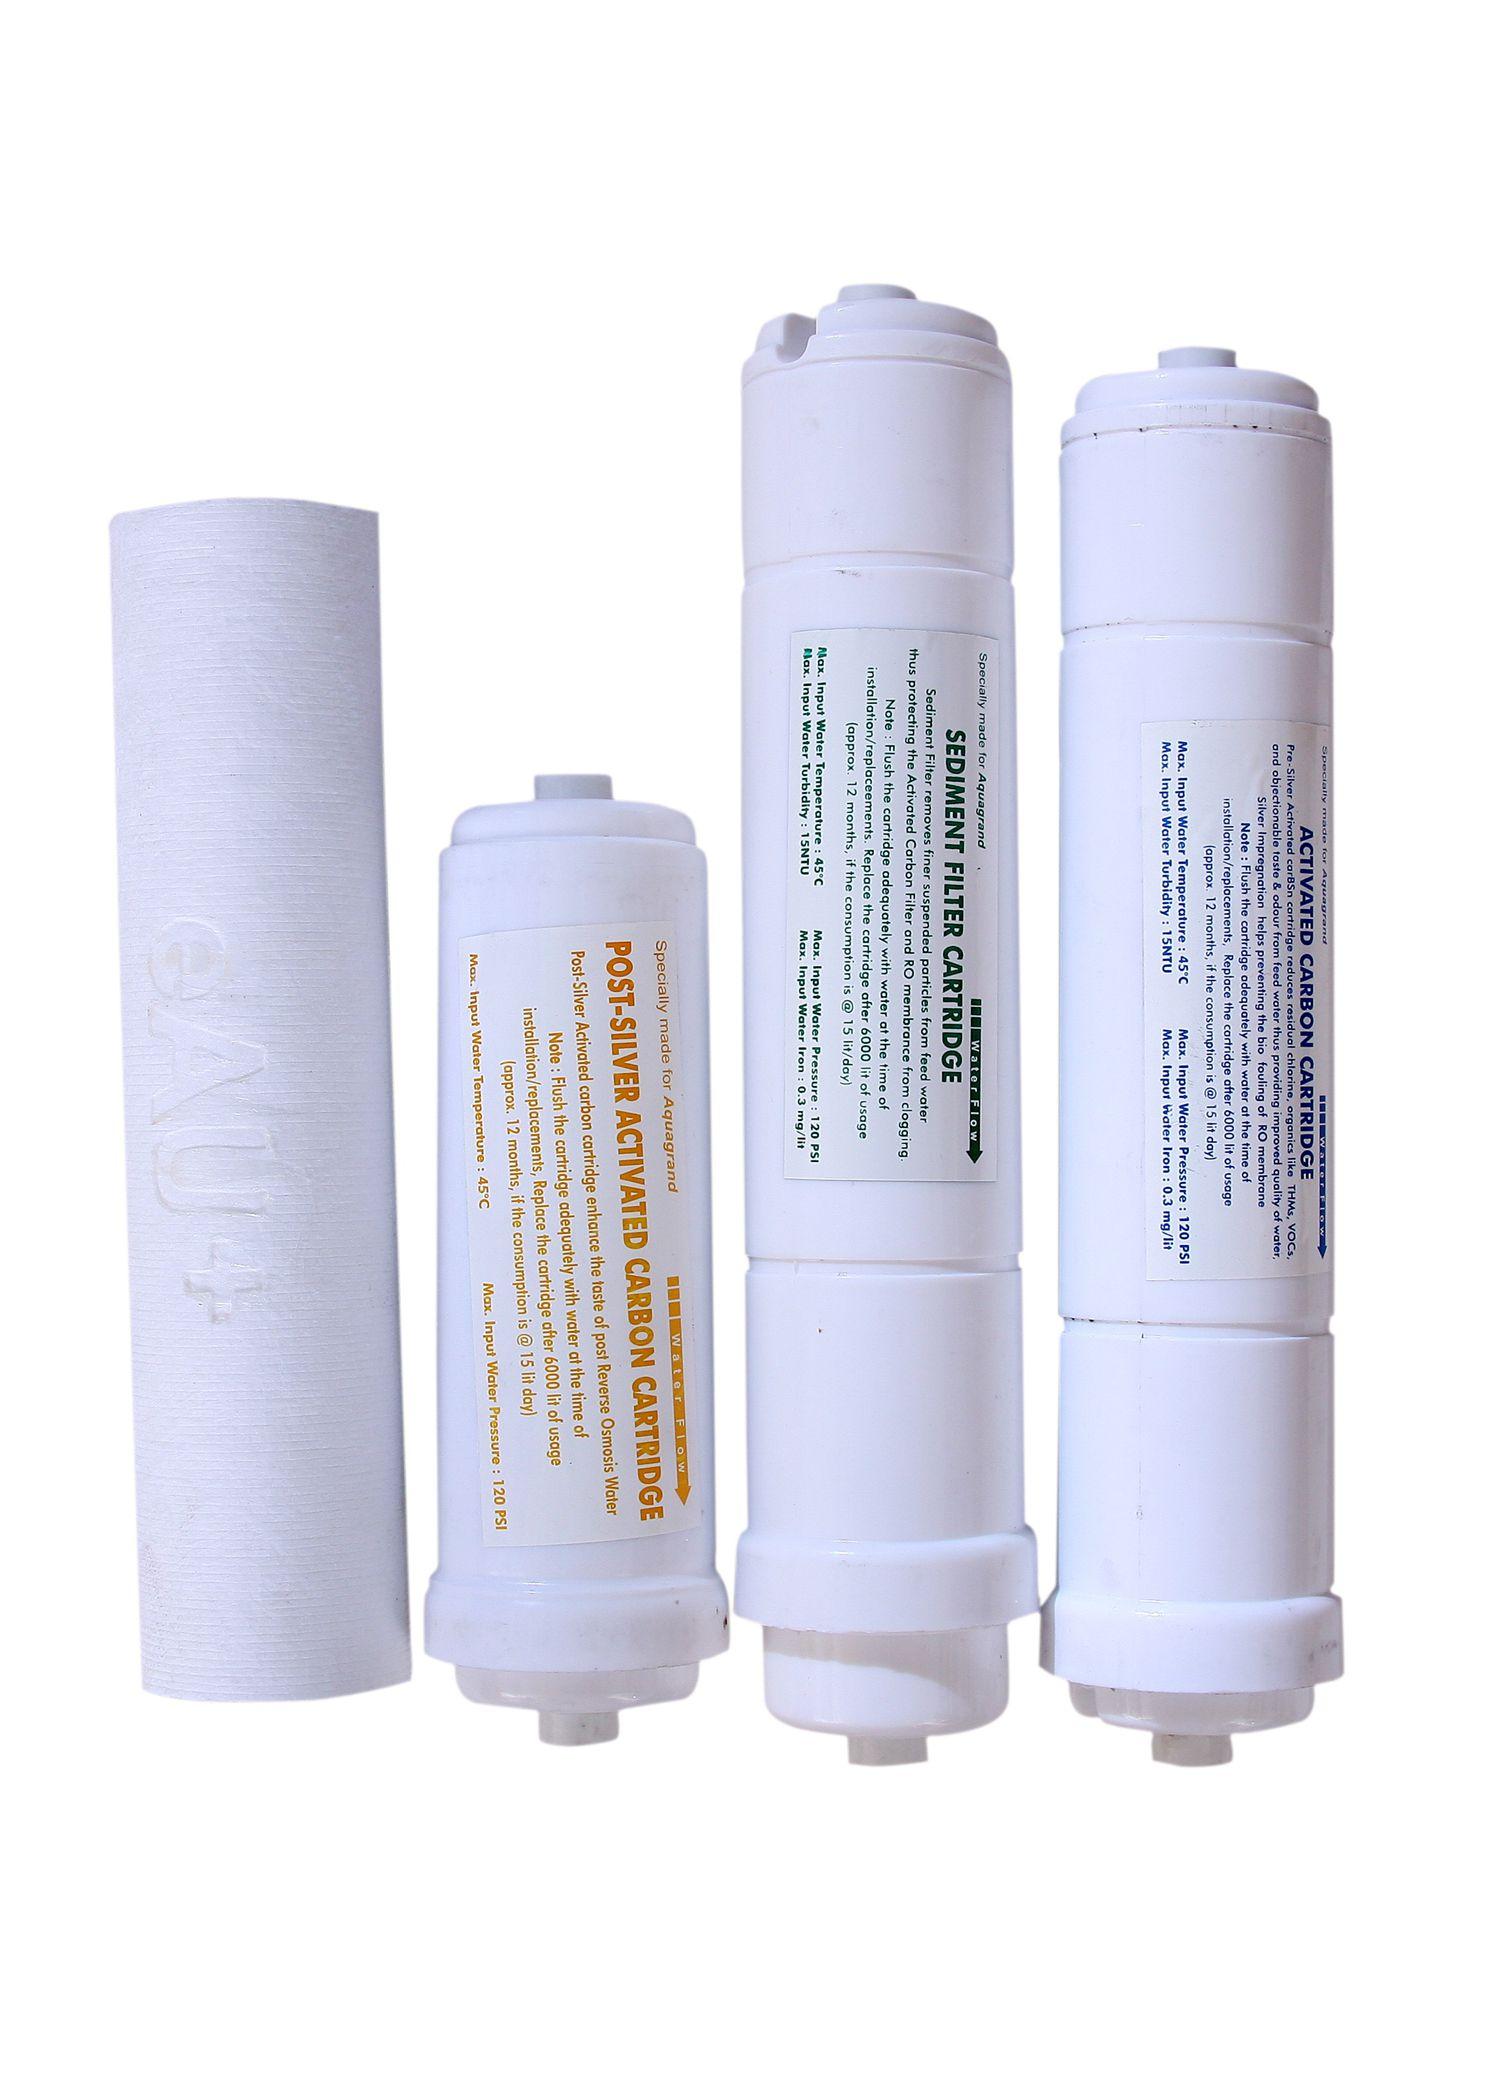 active pro misty basic 15 ltr ro water purifier buy online best